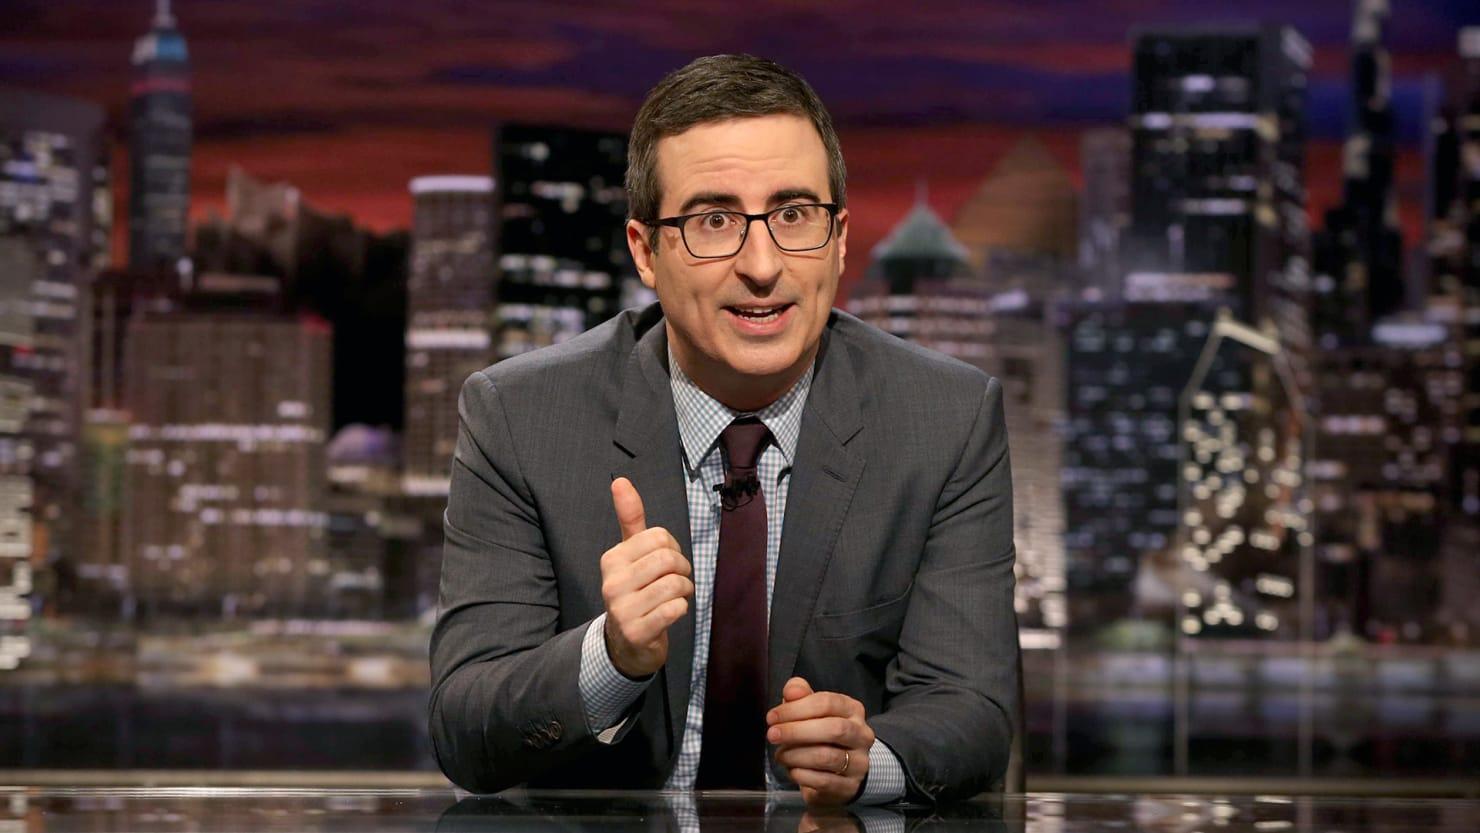 John Oliver Goes Off on 'Racist' Fox News Host Laura Ingraham Over Anti-Immigrant Rant